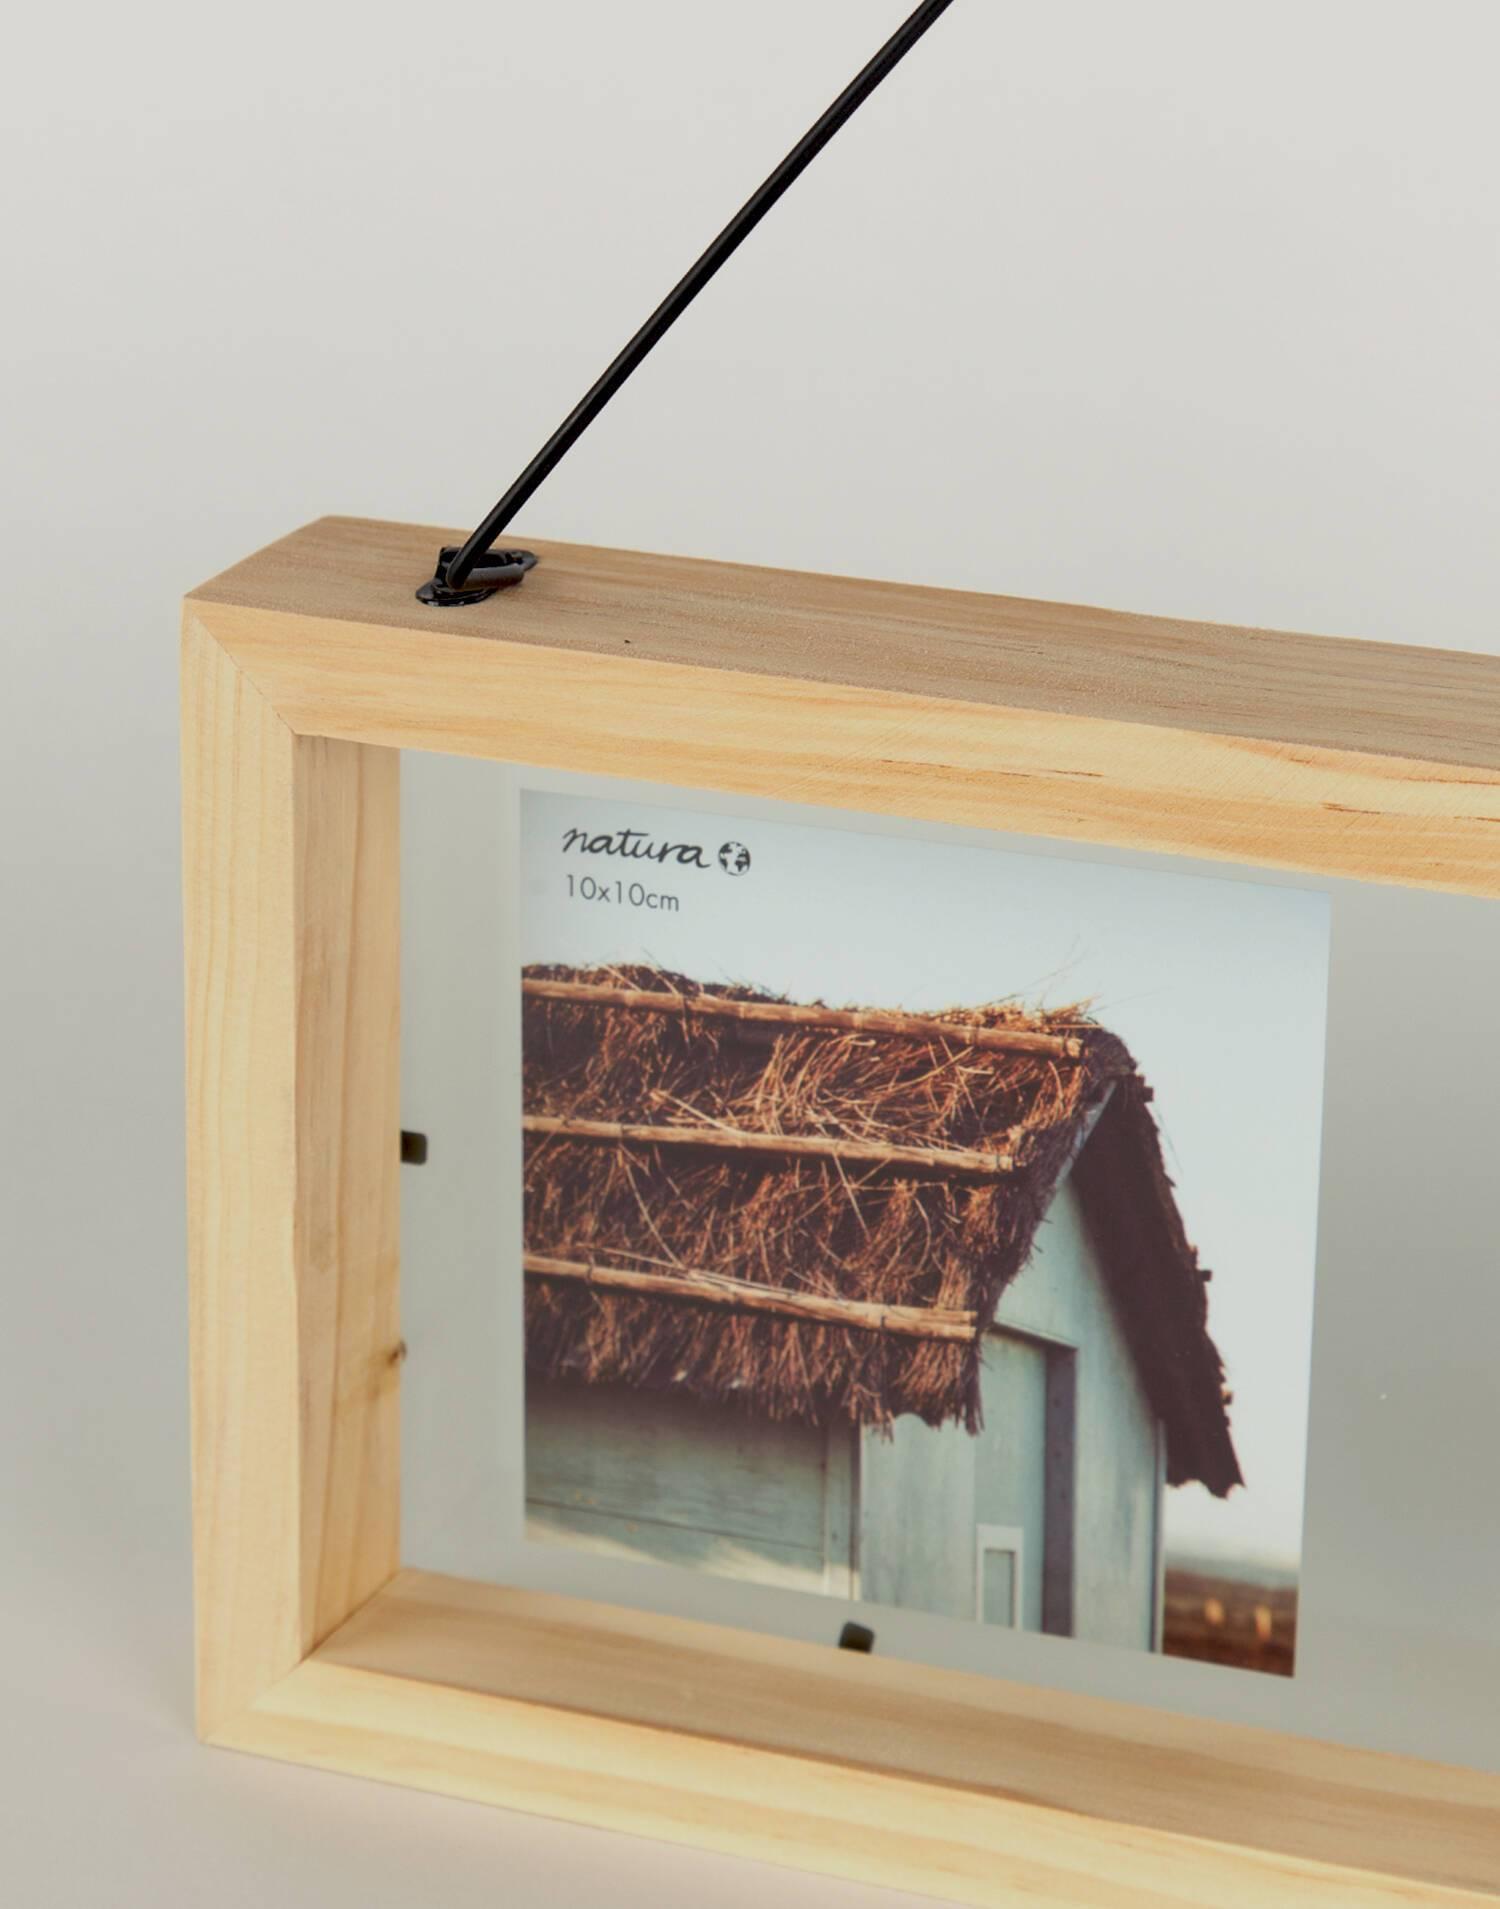 Wood frame with metal hanger